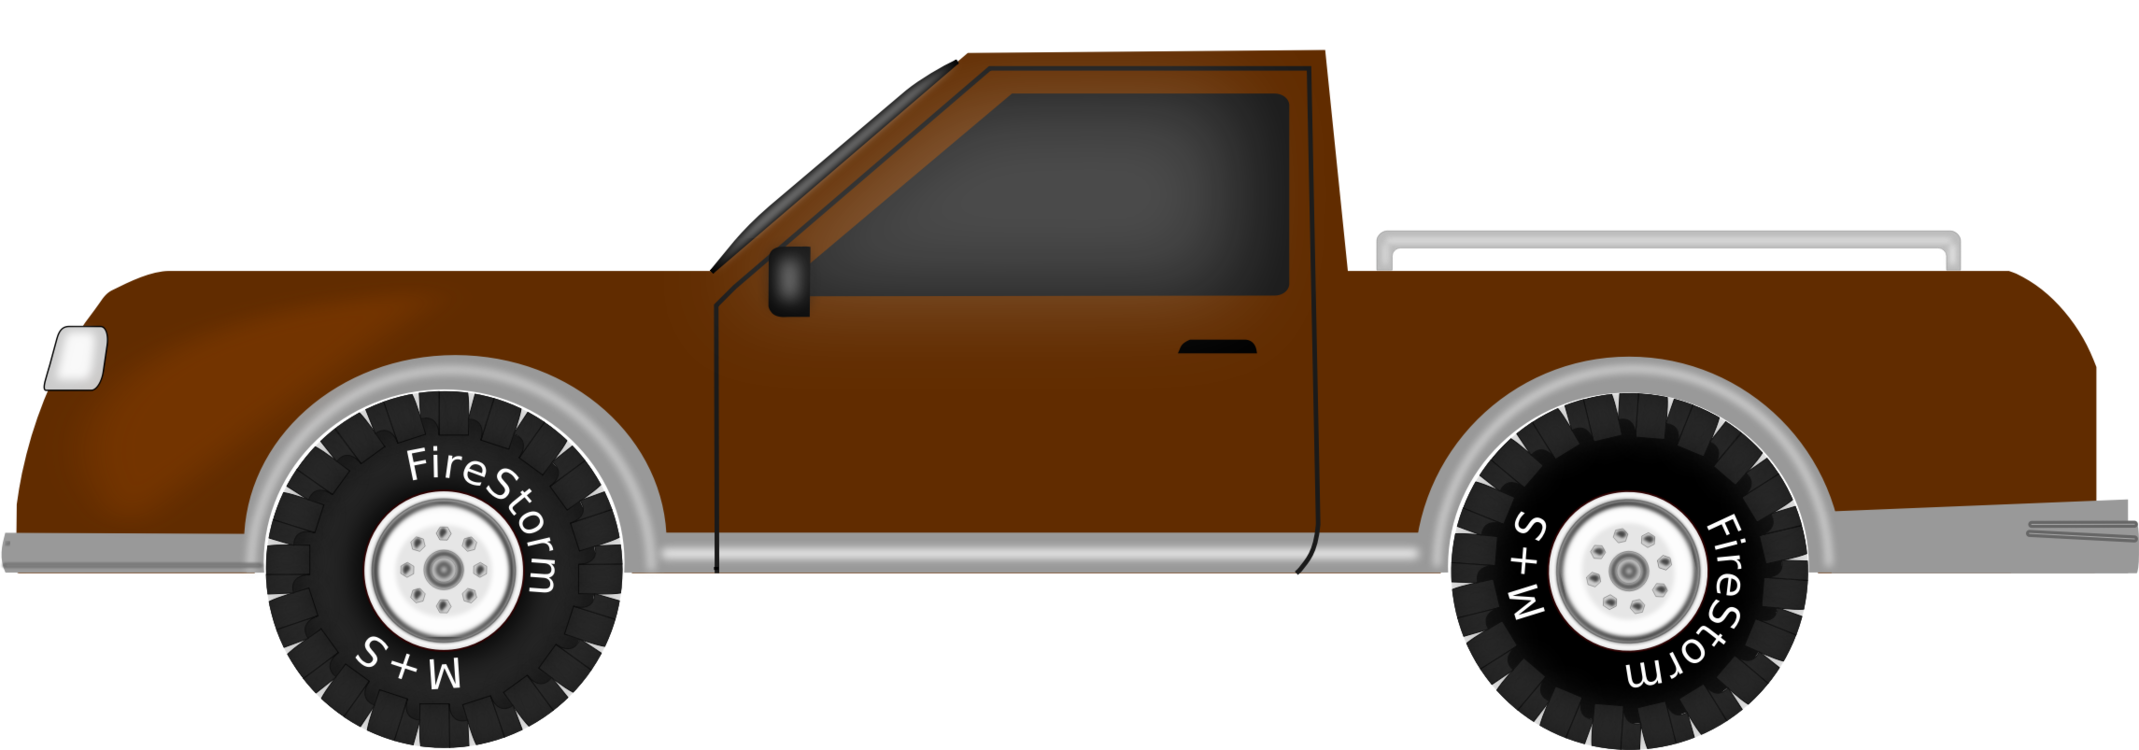 Wheel,Commercial Vehicle,Automotive Exterior